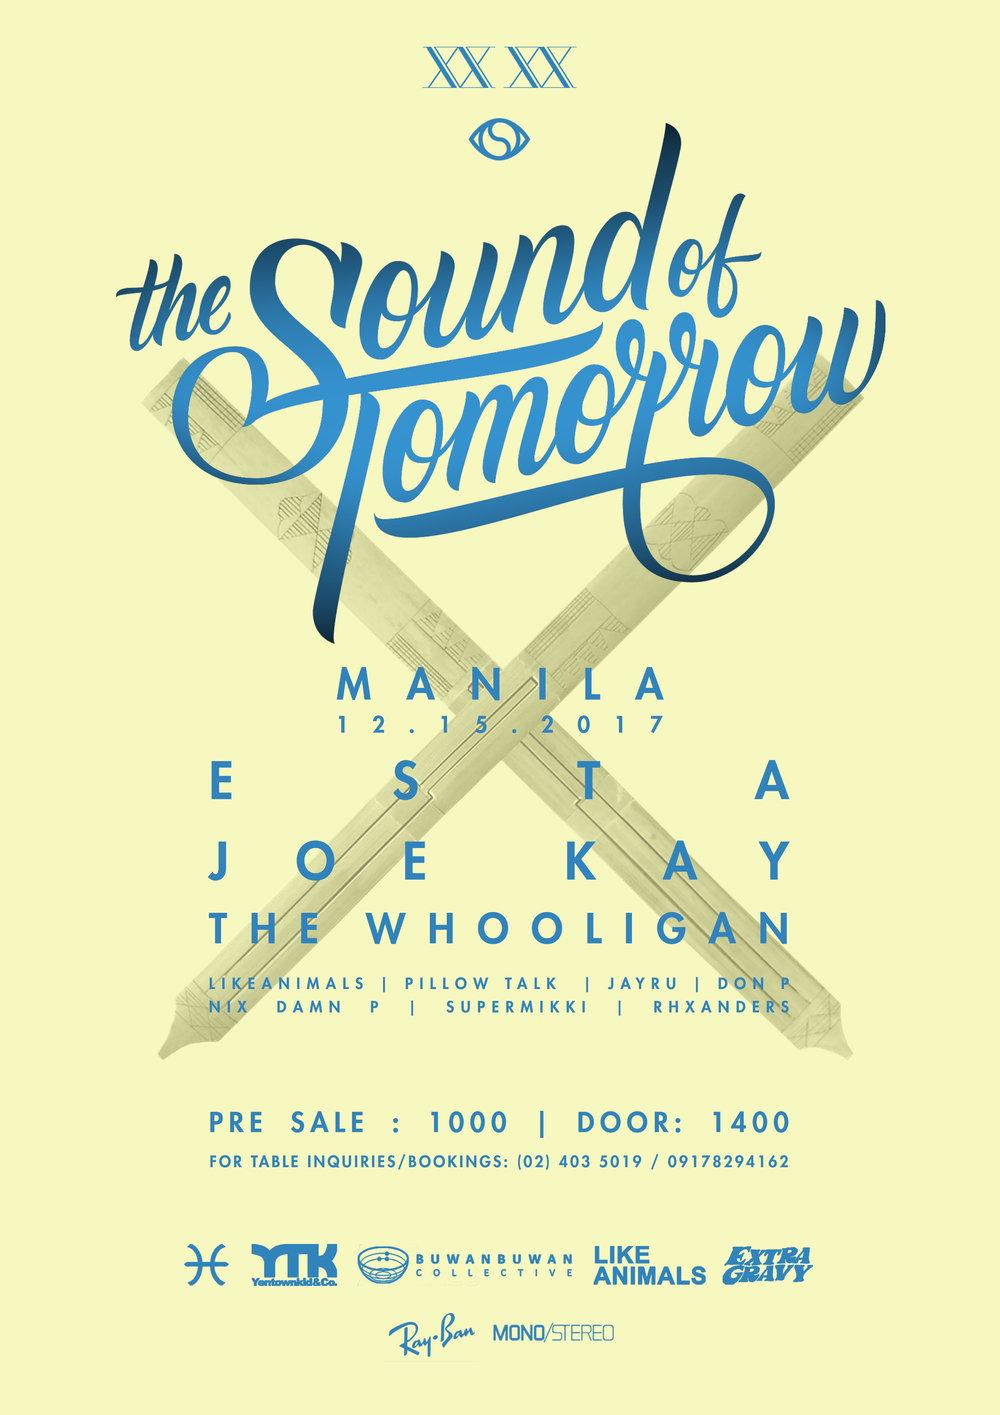 TSOT Manila 2017 Poster.jpg